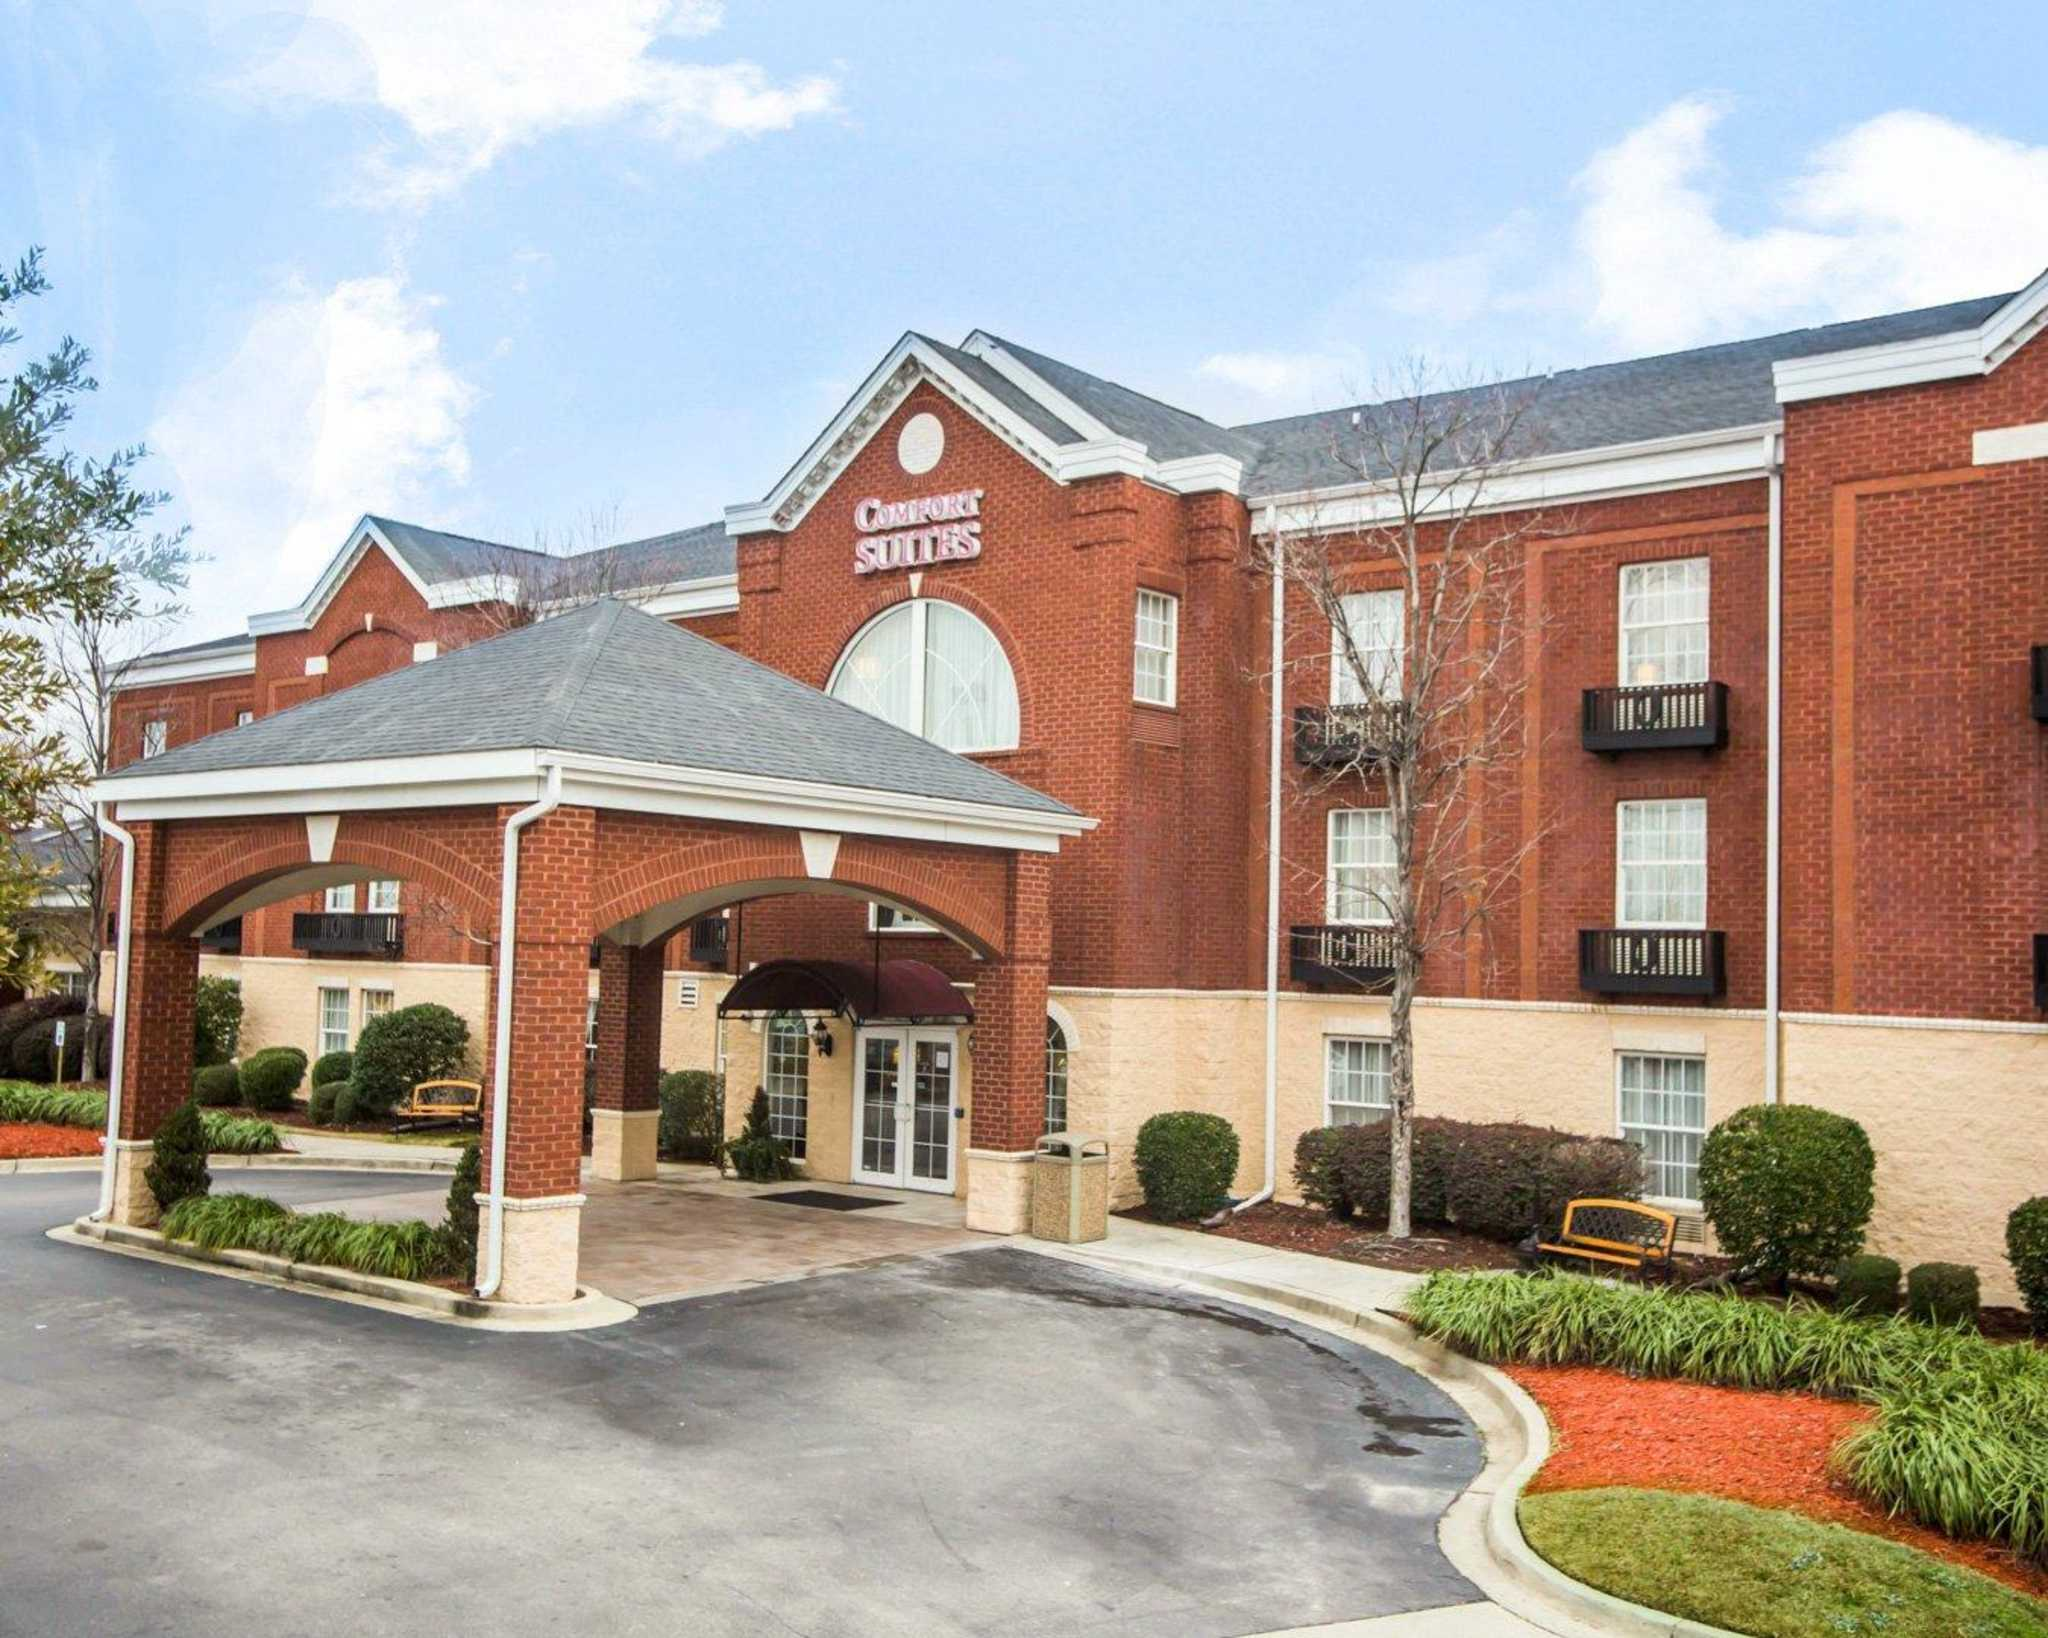 Comfort Suites in Sumter, SC - (803) 469-0...